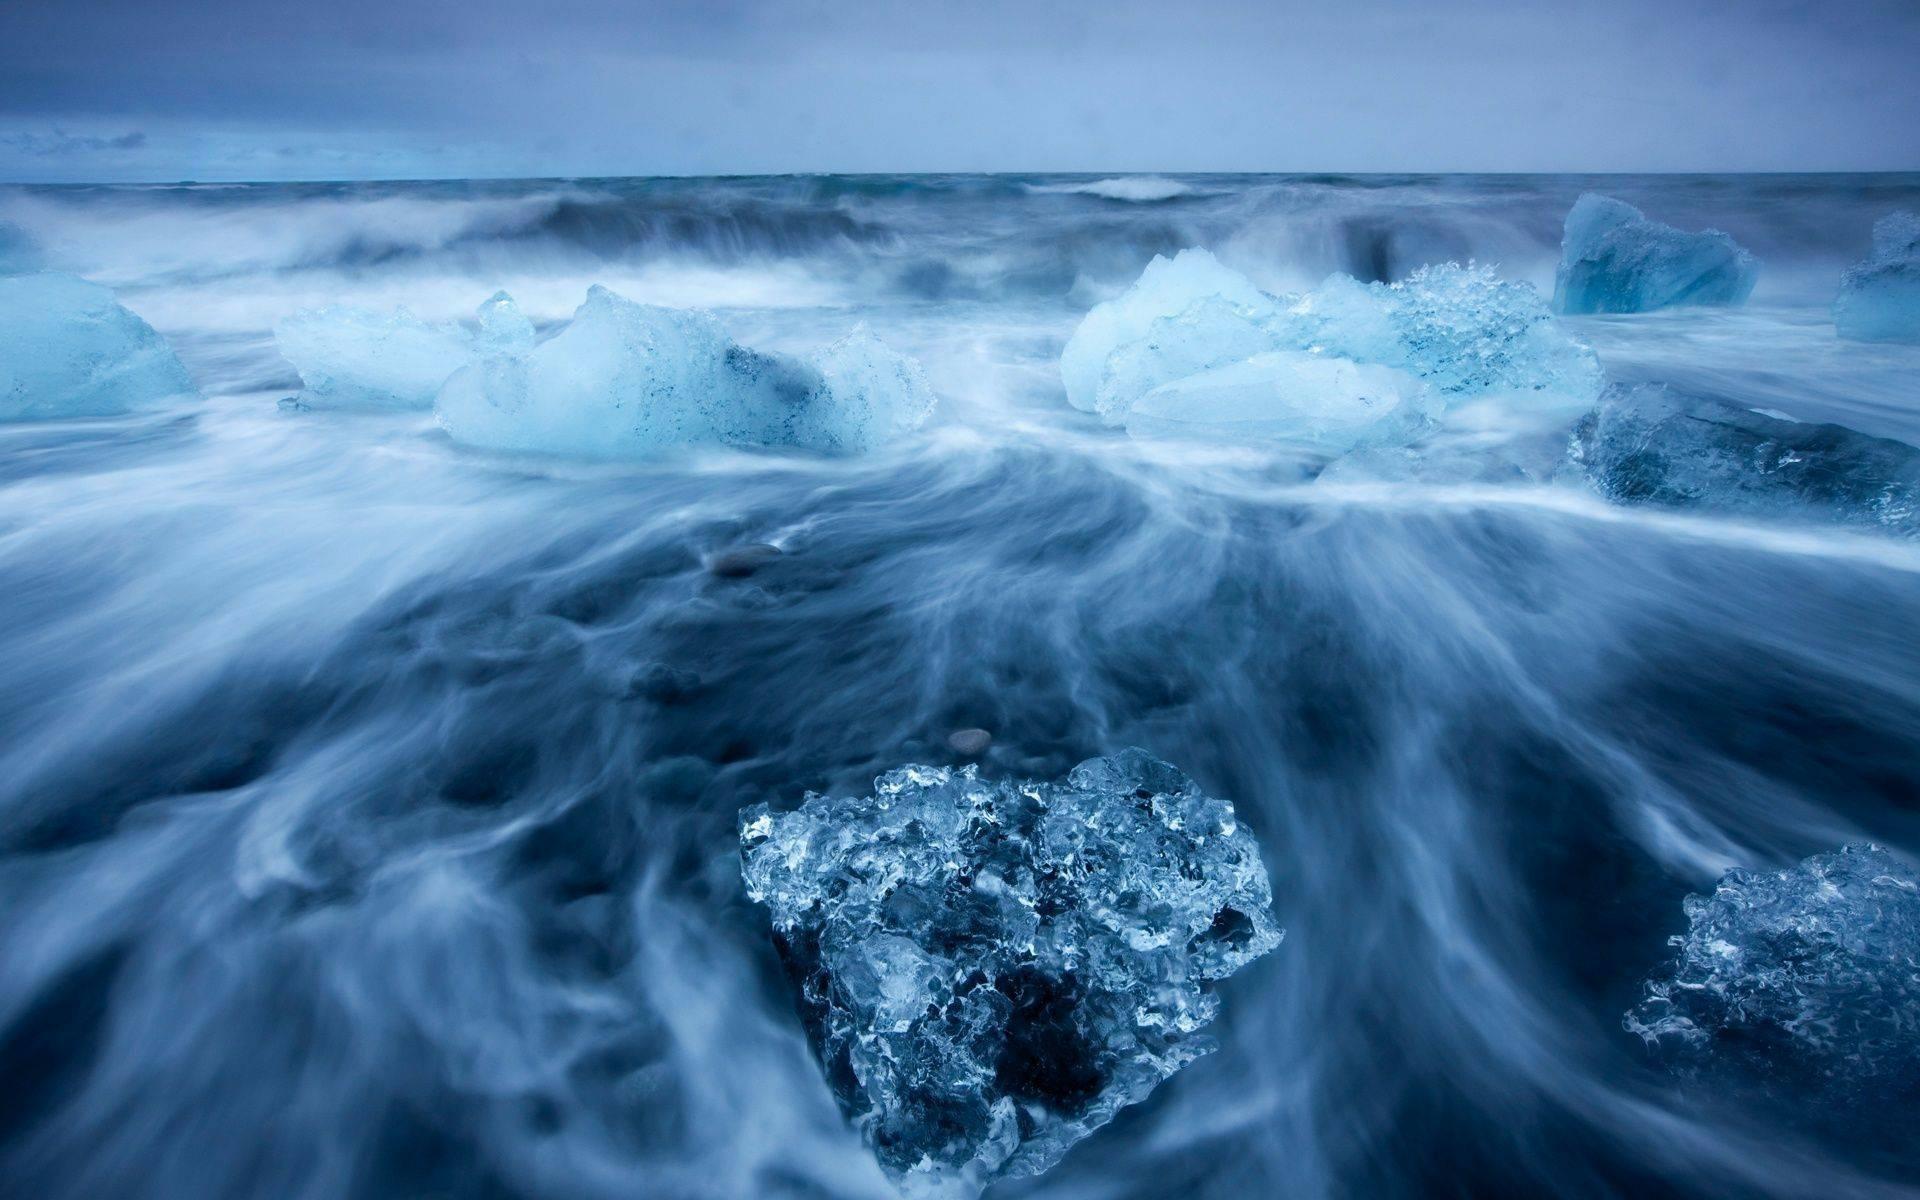 Blue-icy-ocean-wallpaper-HD